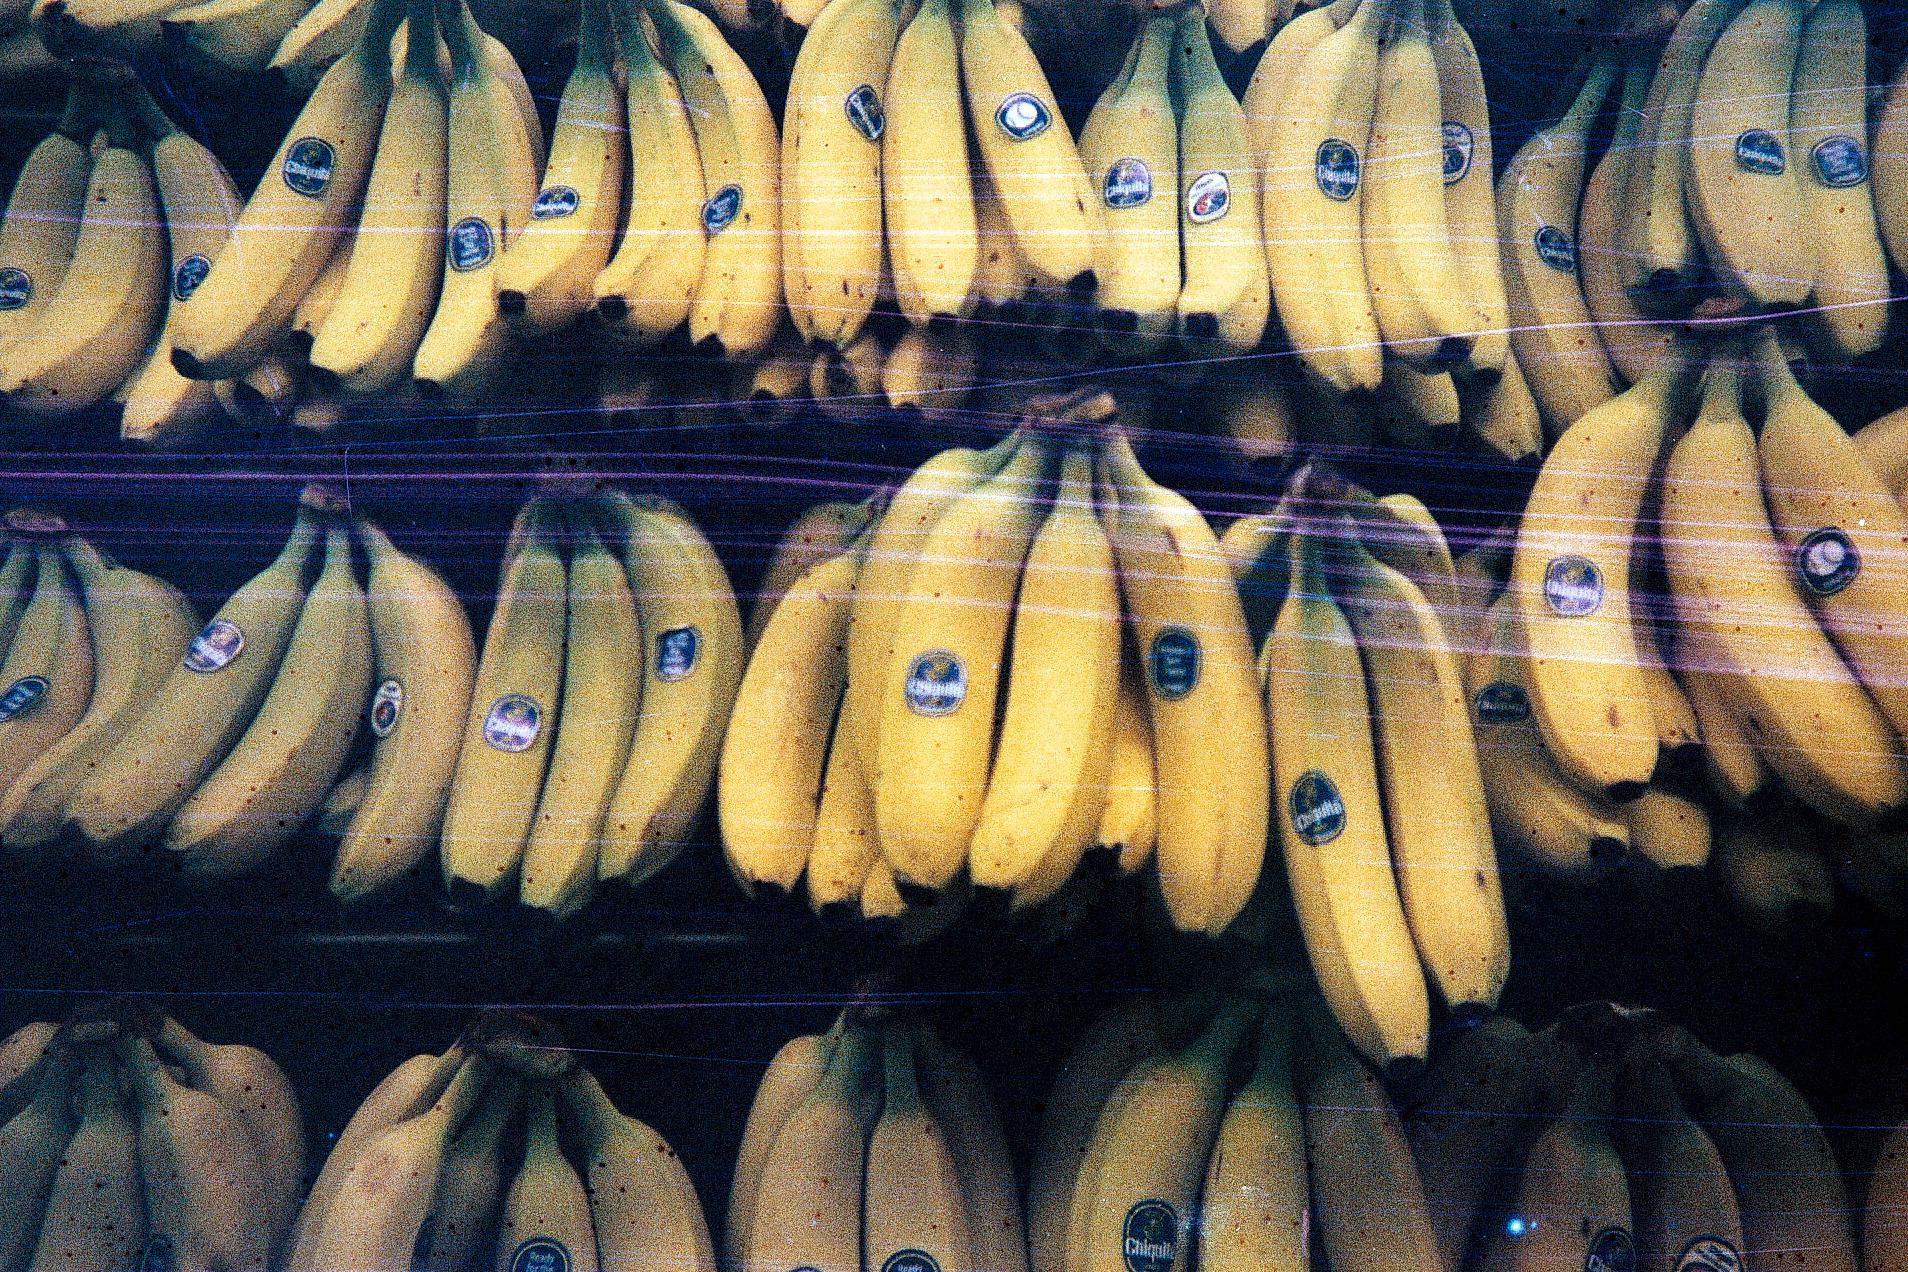 Electric Bananas.jpg